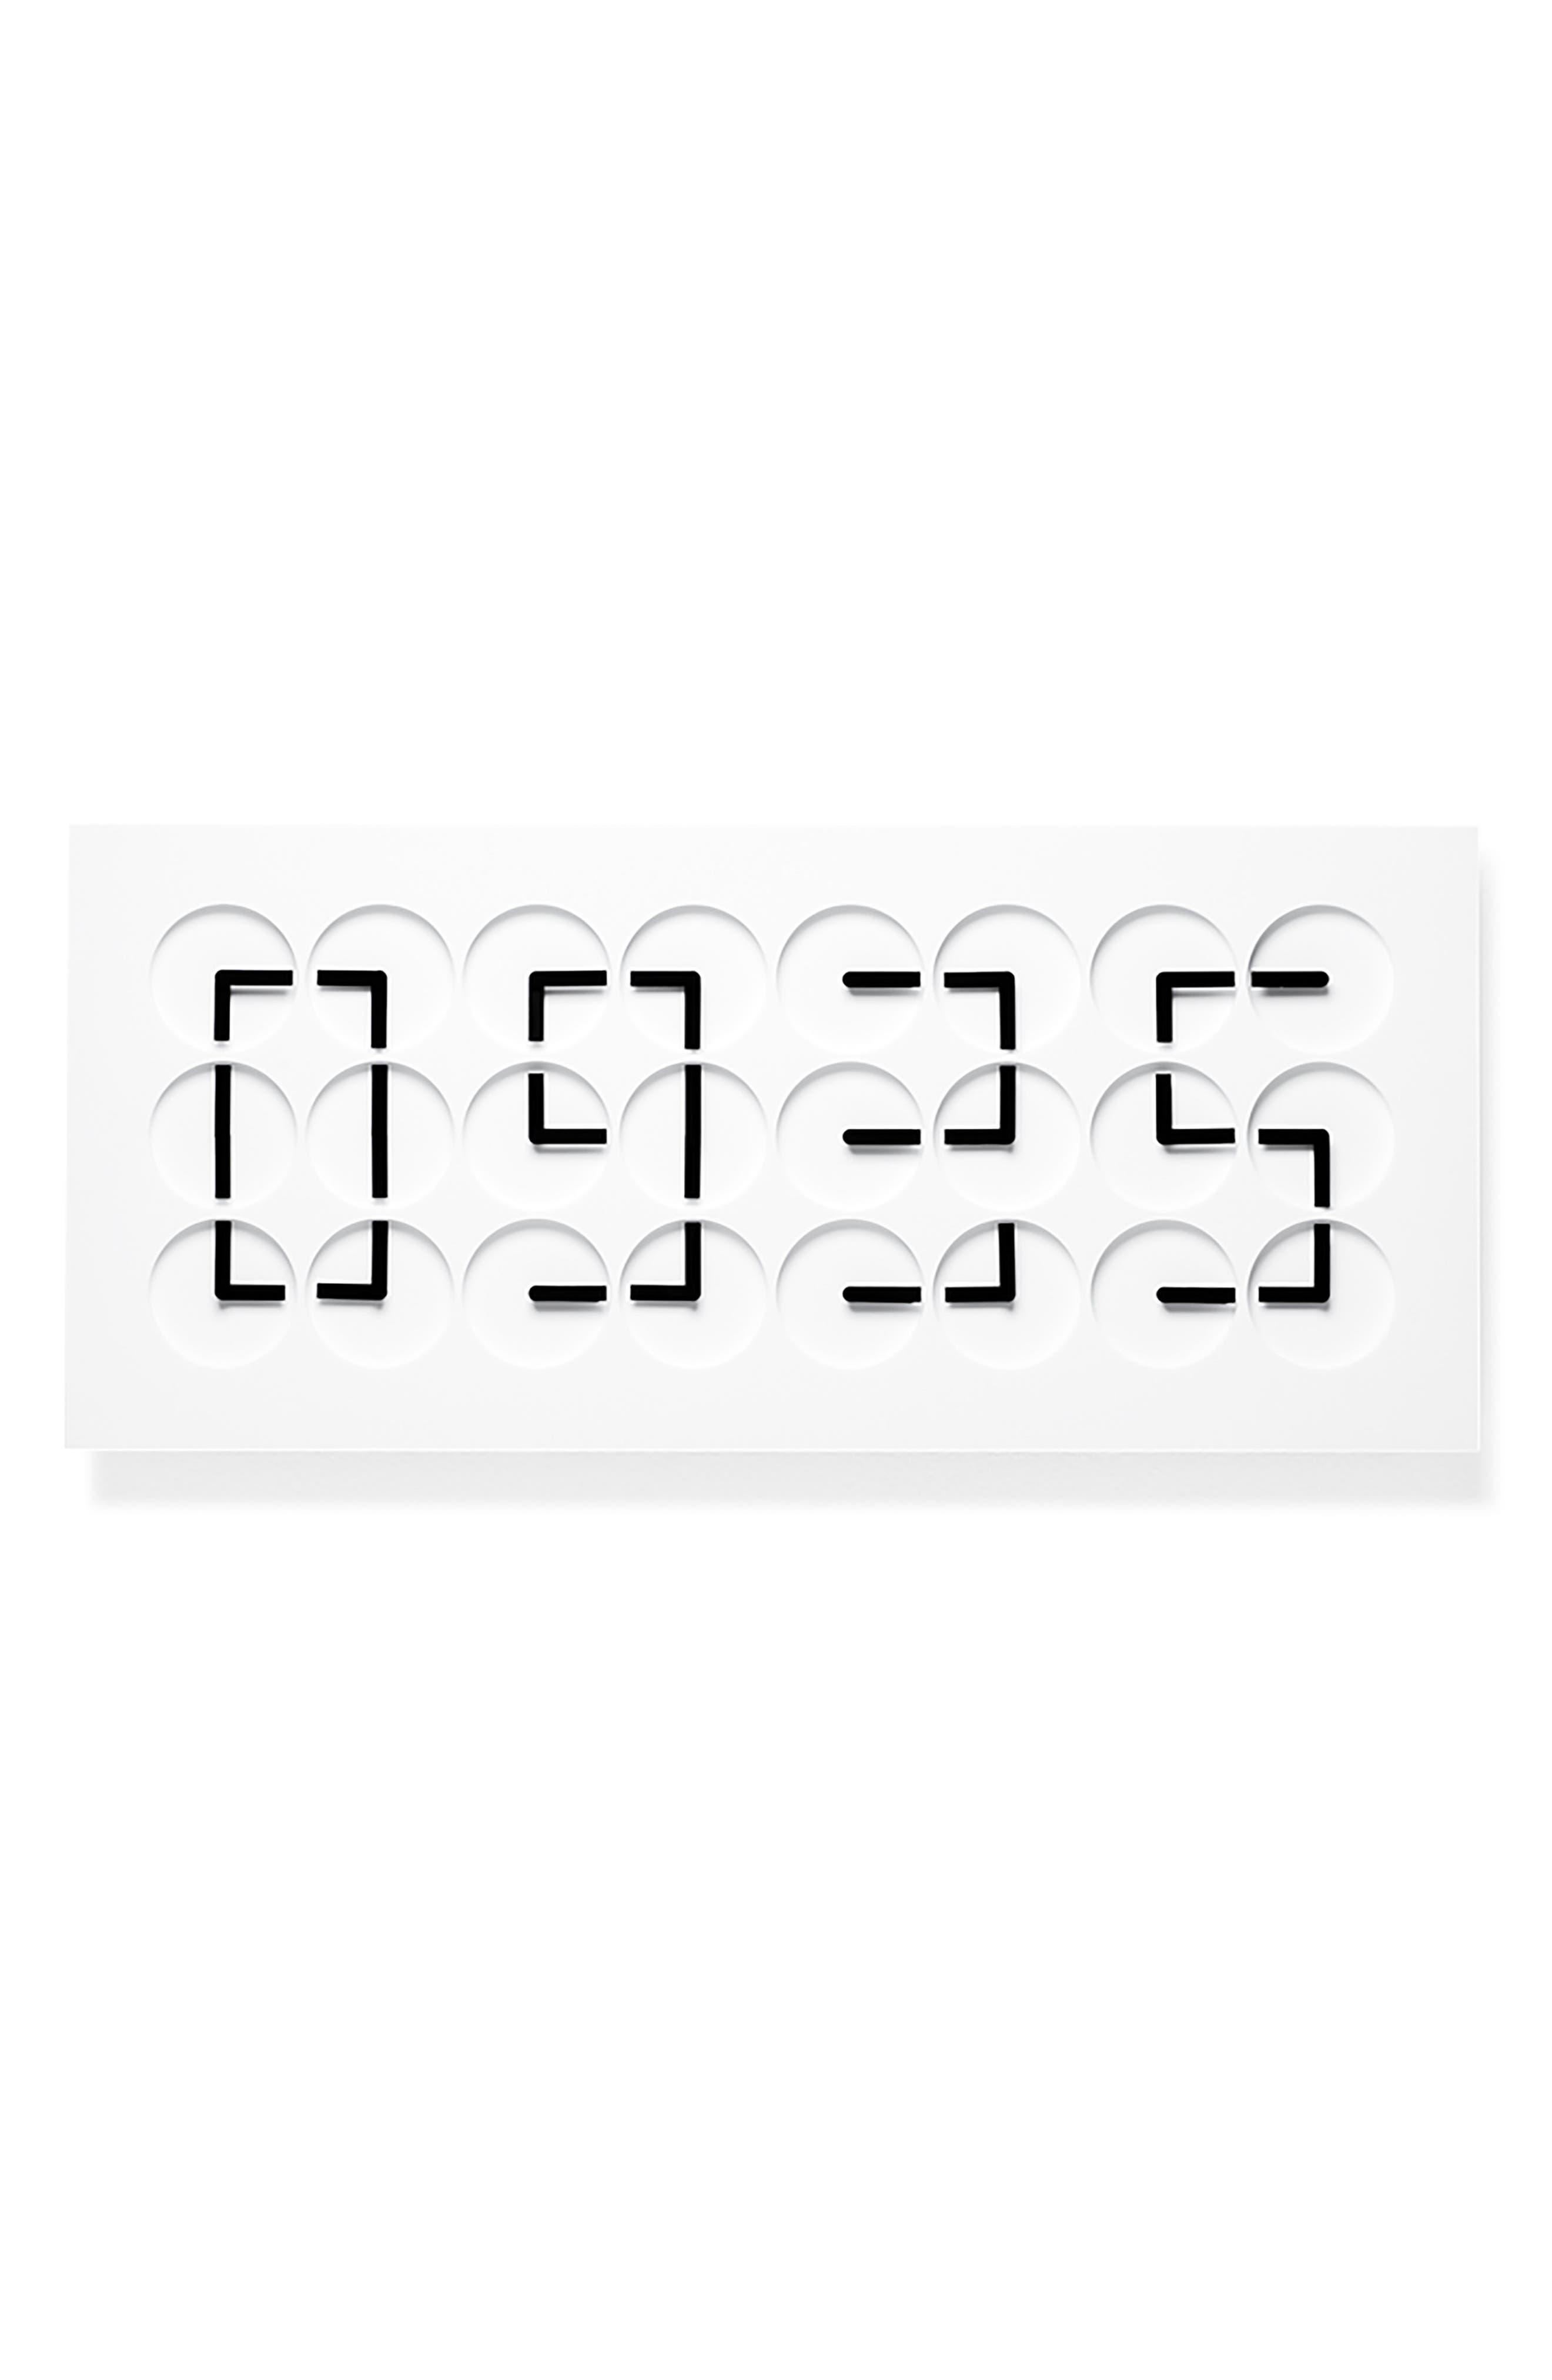 Alternate Image 2  - MoMA Design Store ClockClock 24 Digital Clock